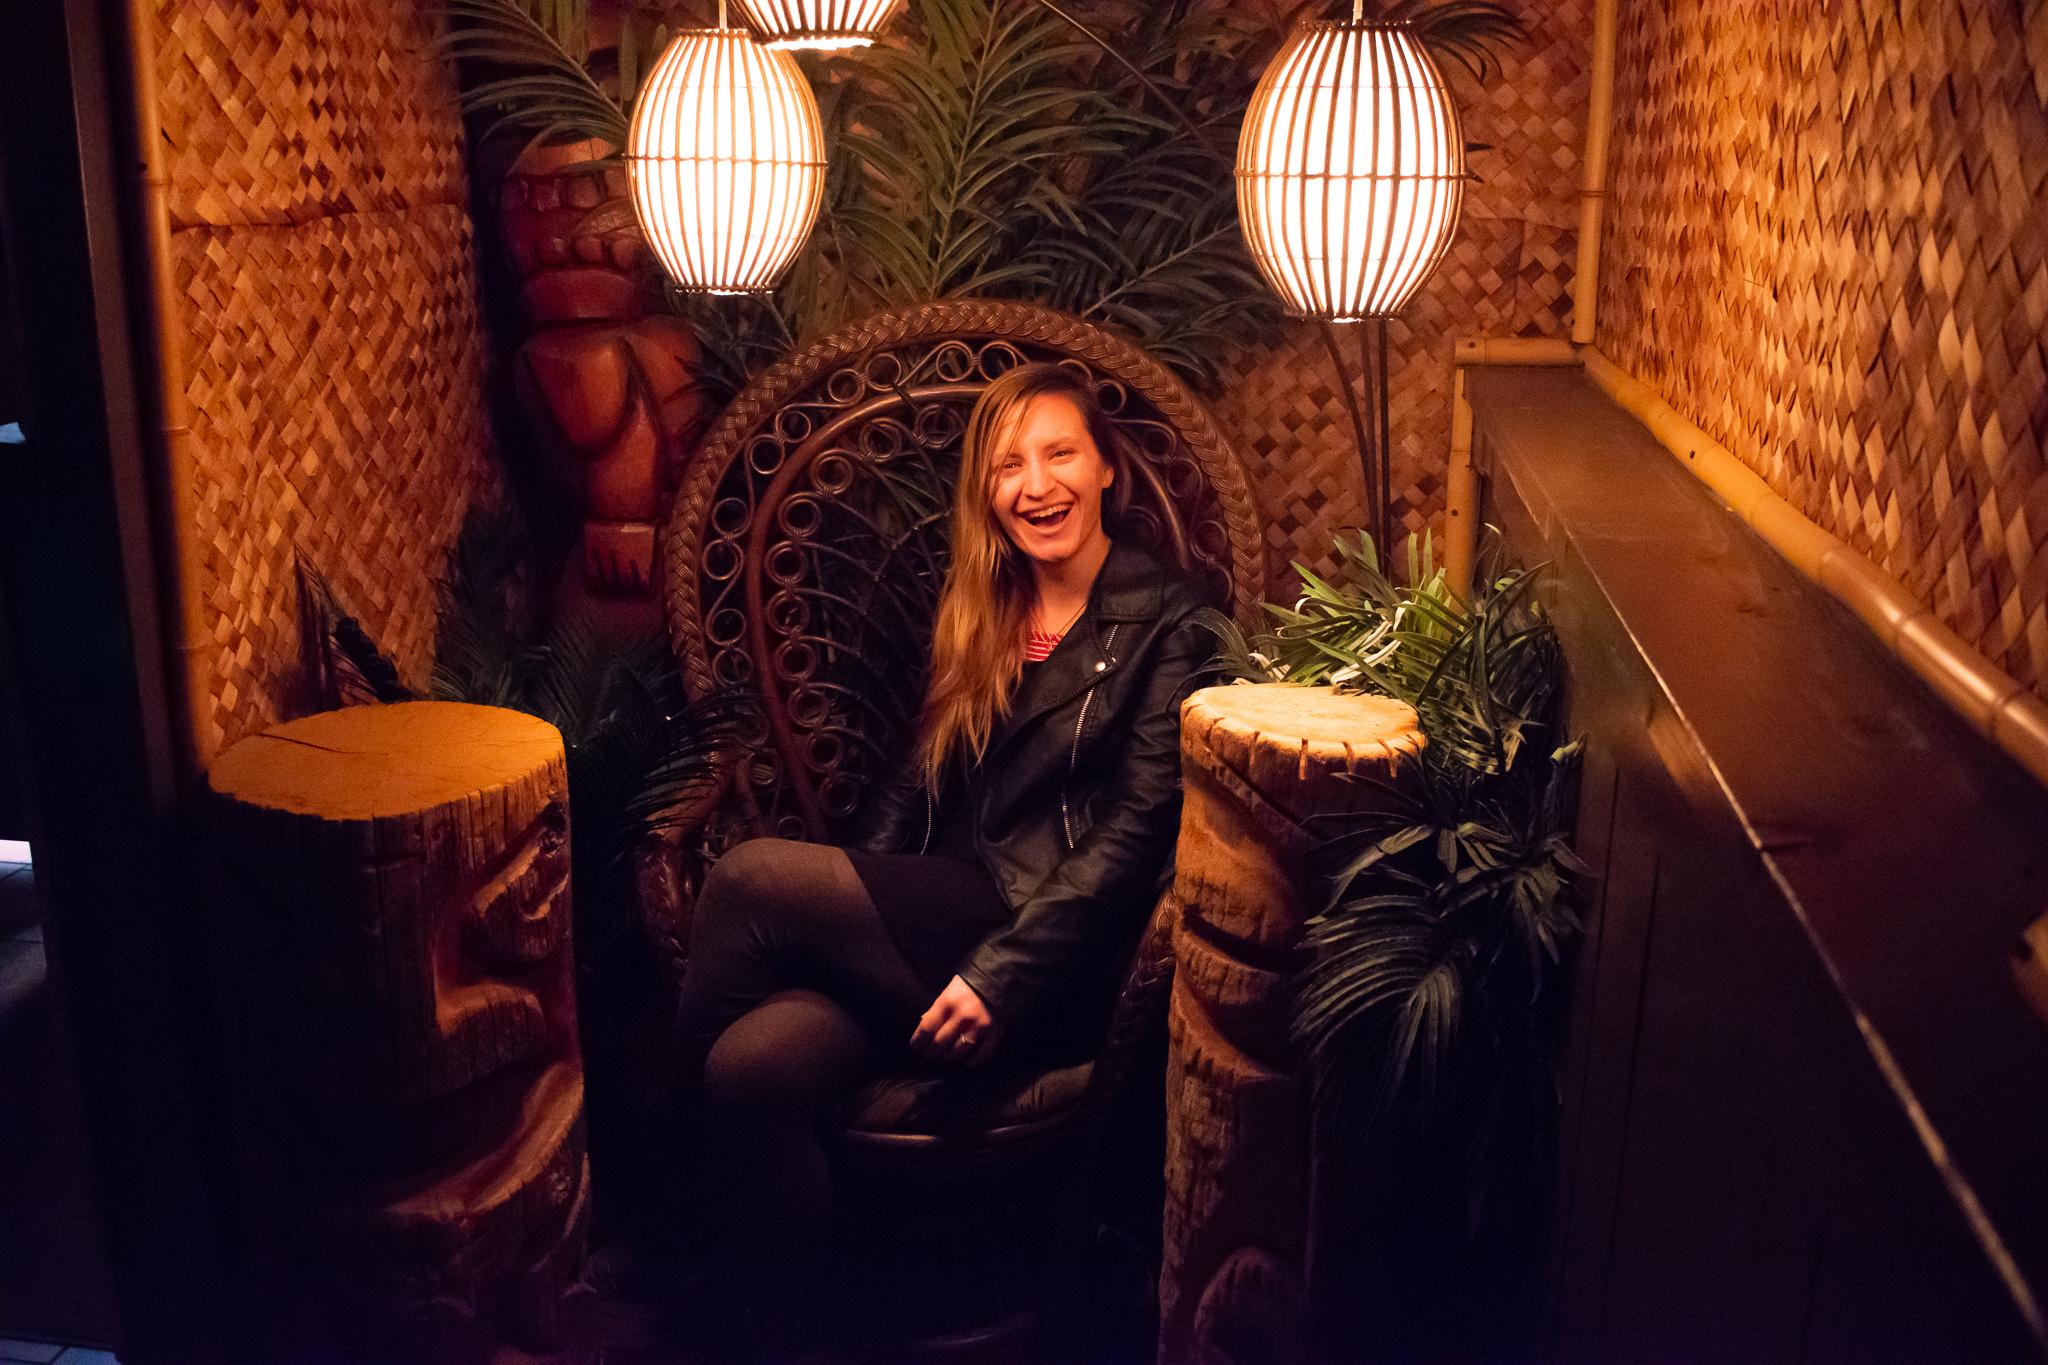 uprooted-traveler-psycho-suzis-minneapolis-st-queen-tiki-drink-motor-lounge.jpg